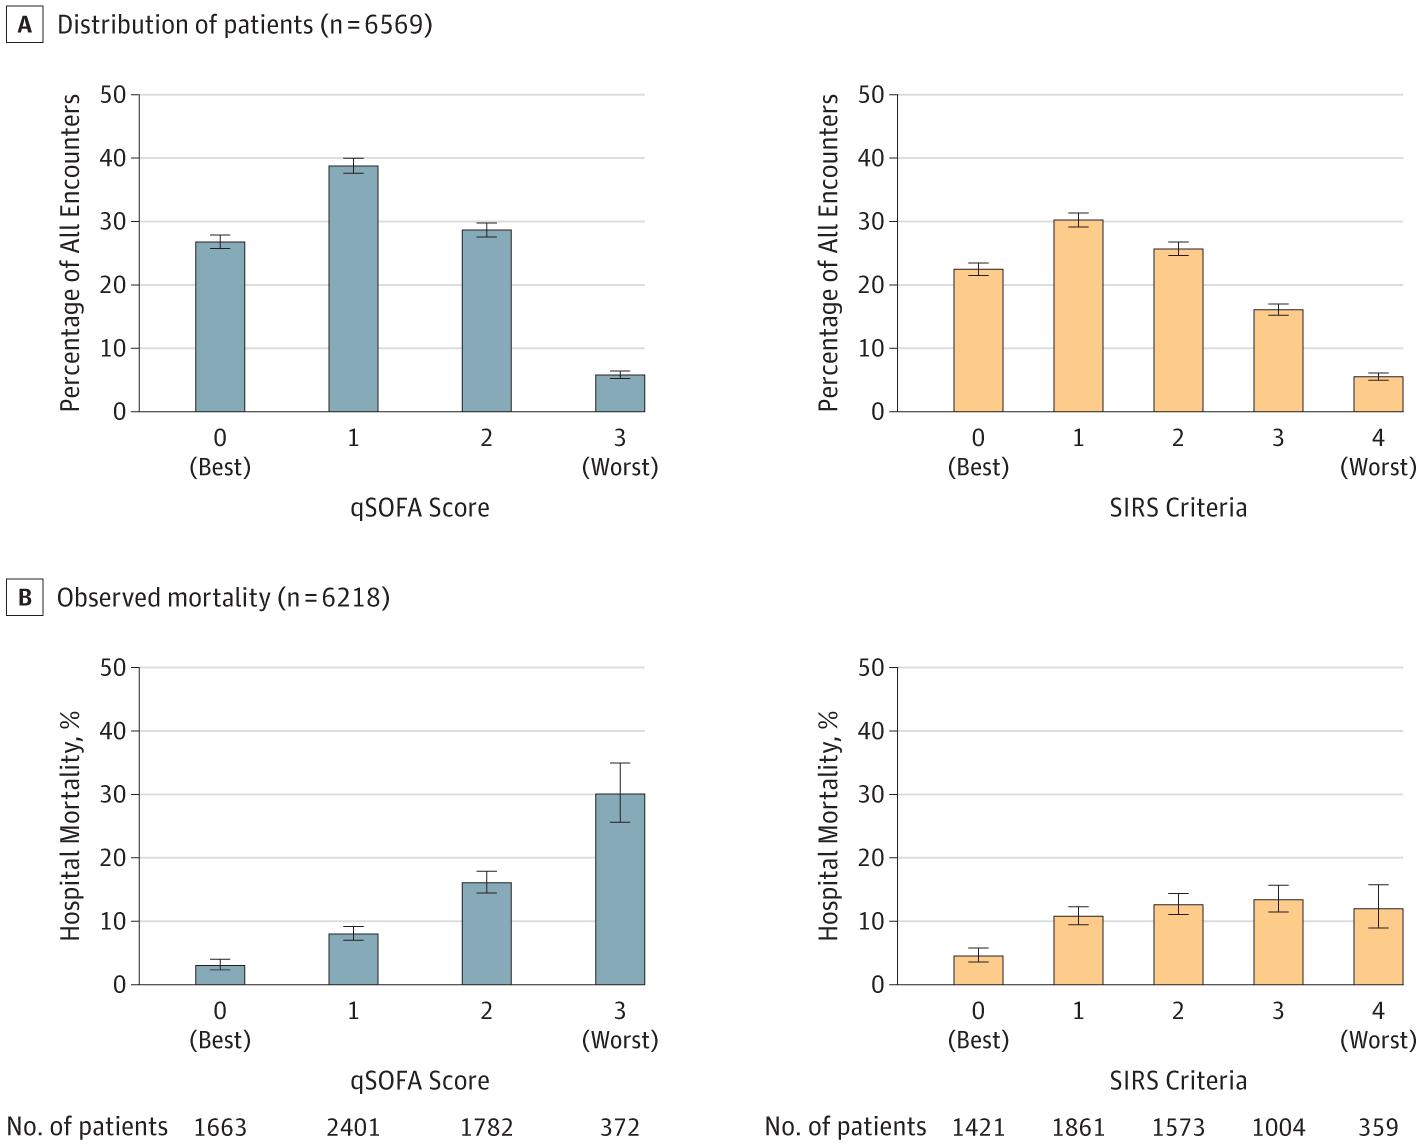 [JAMA在线发表]: 中低收入国家疑似感染成年患者qSOFA评分与过高的住院病死率相关